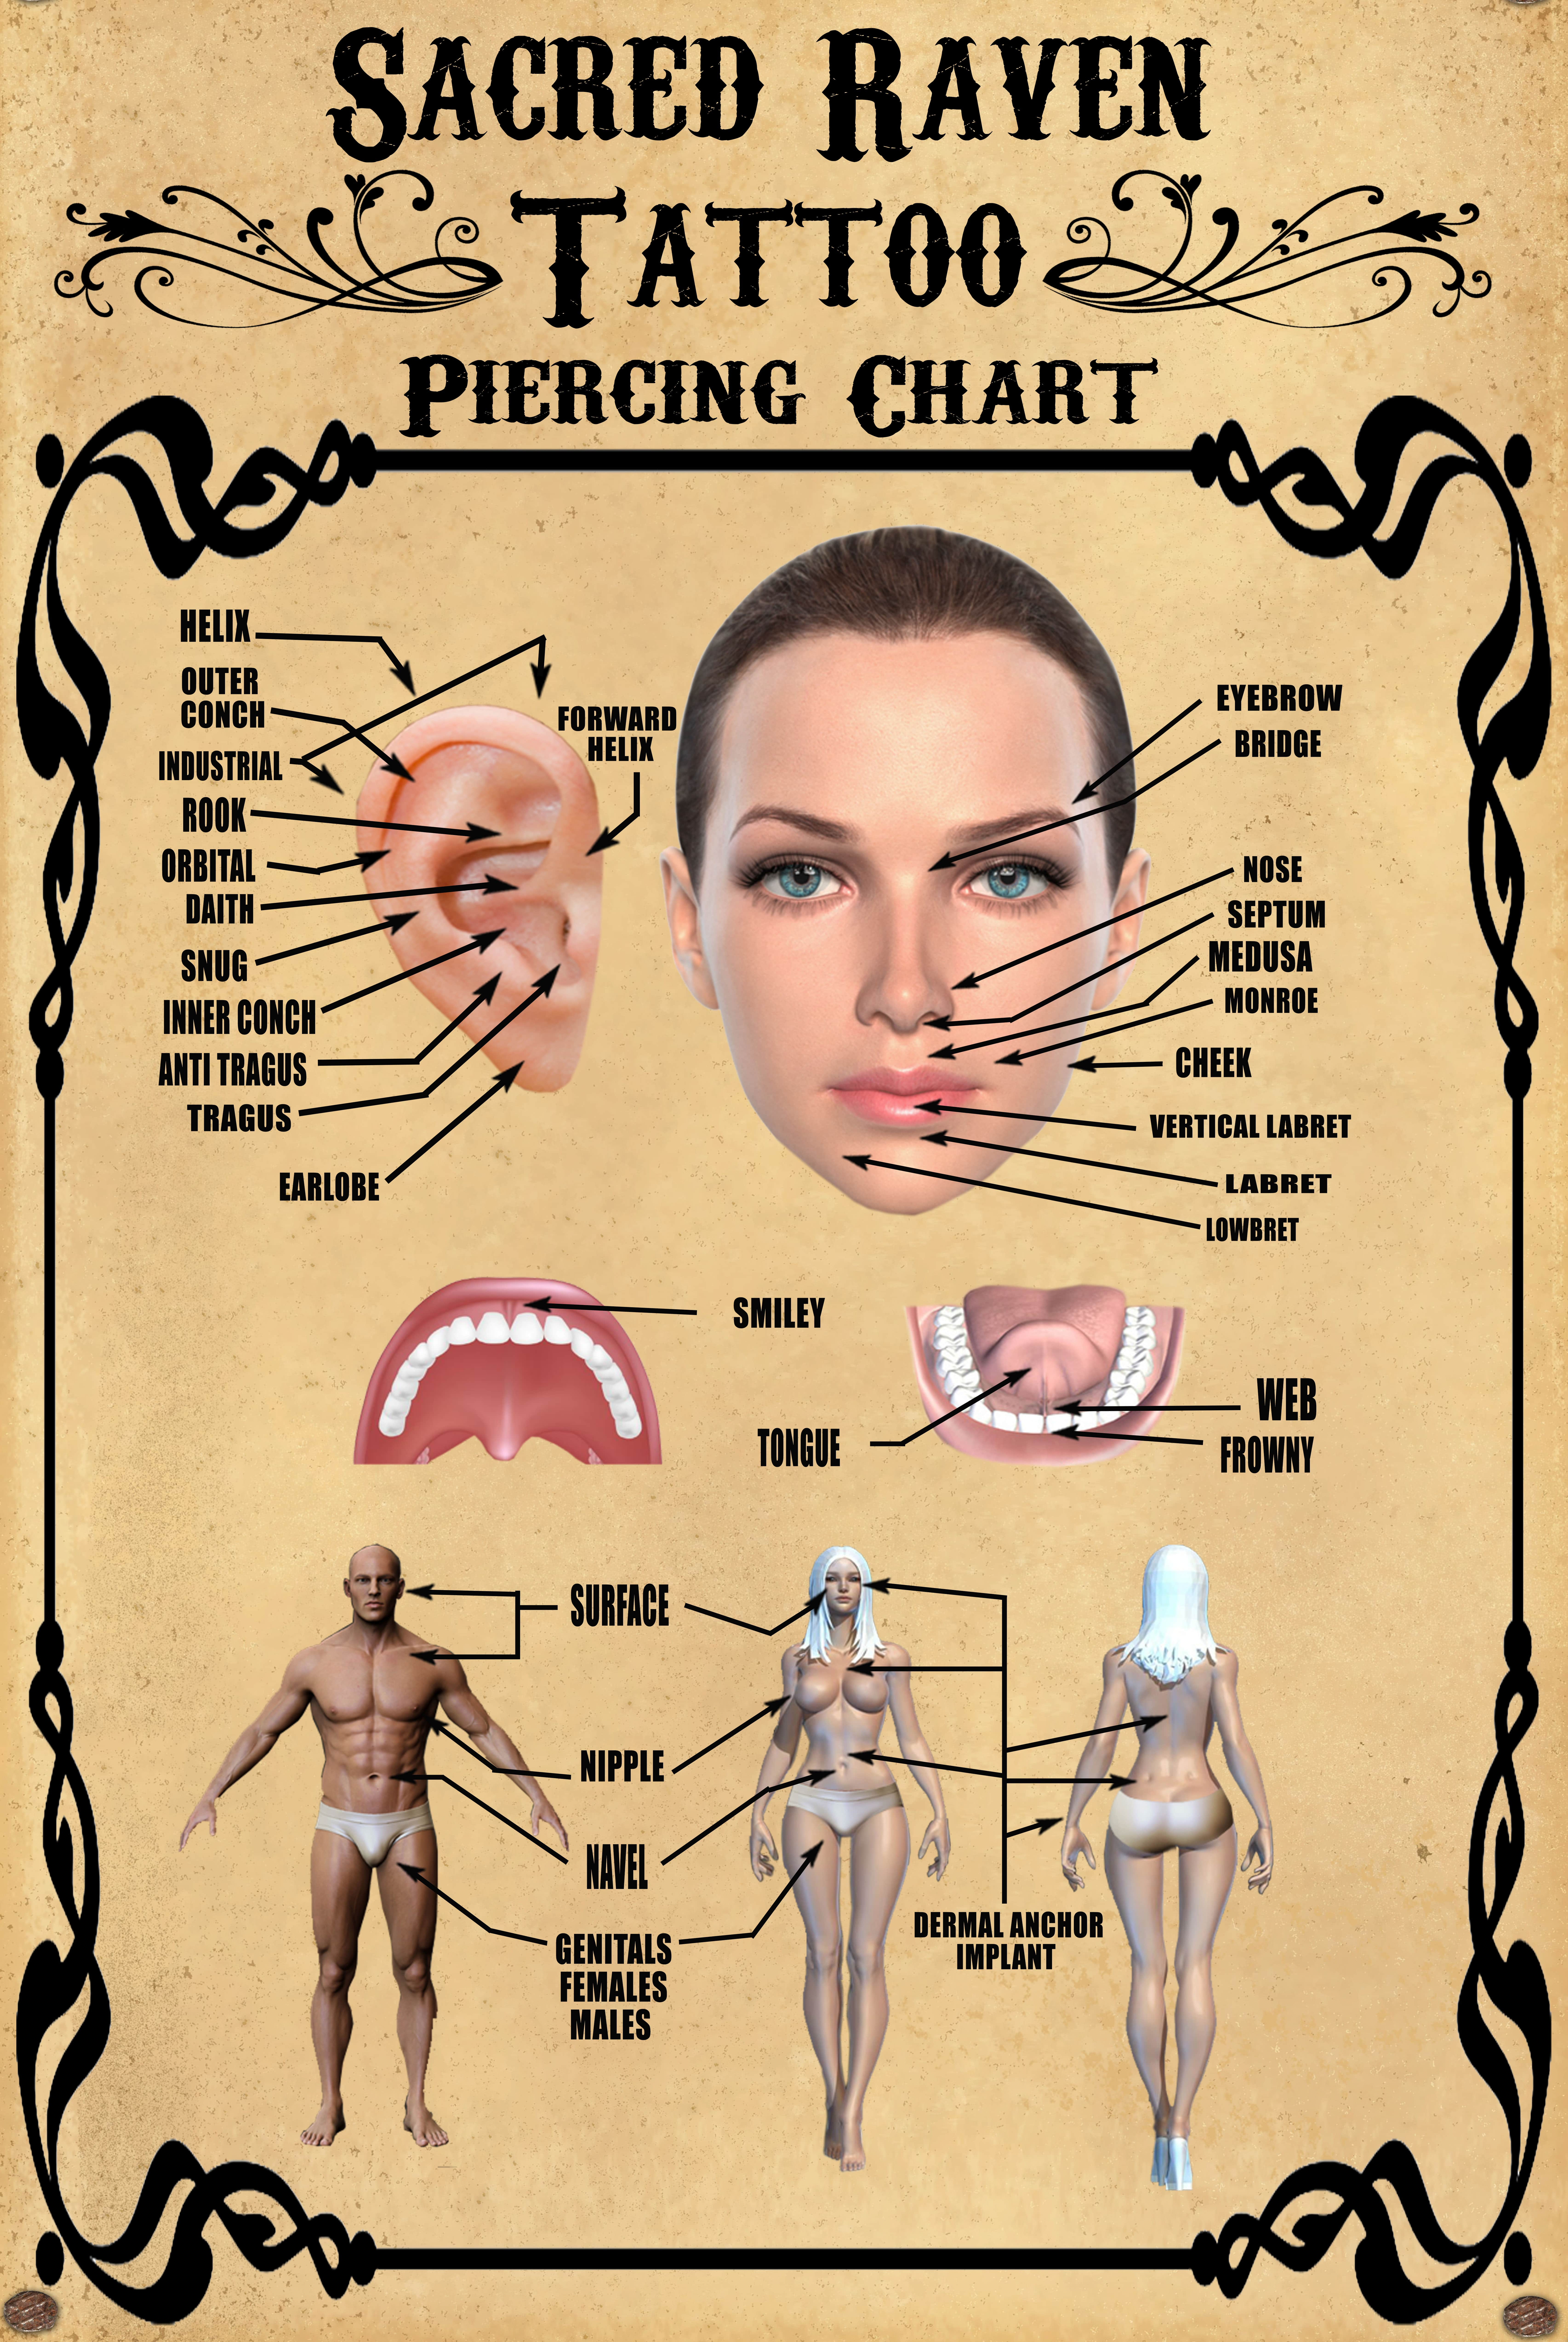 Sacred Raven Tattoo Piercing Chart